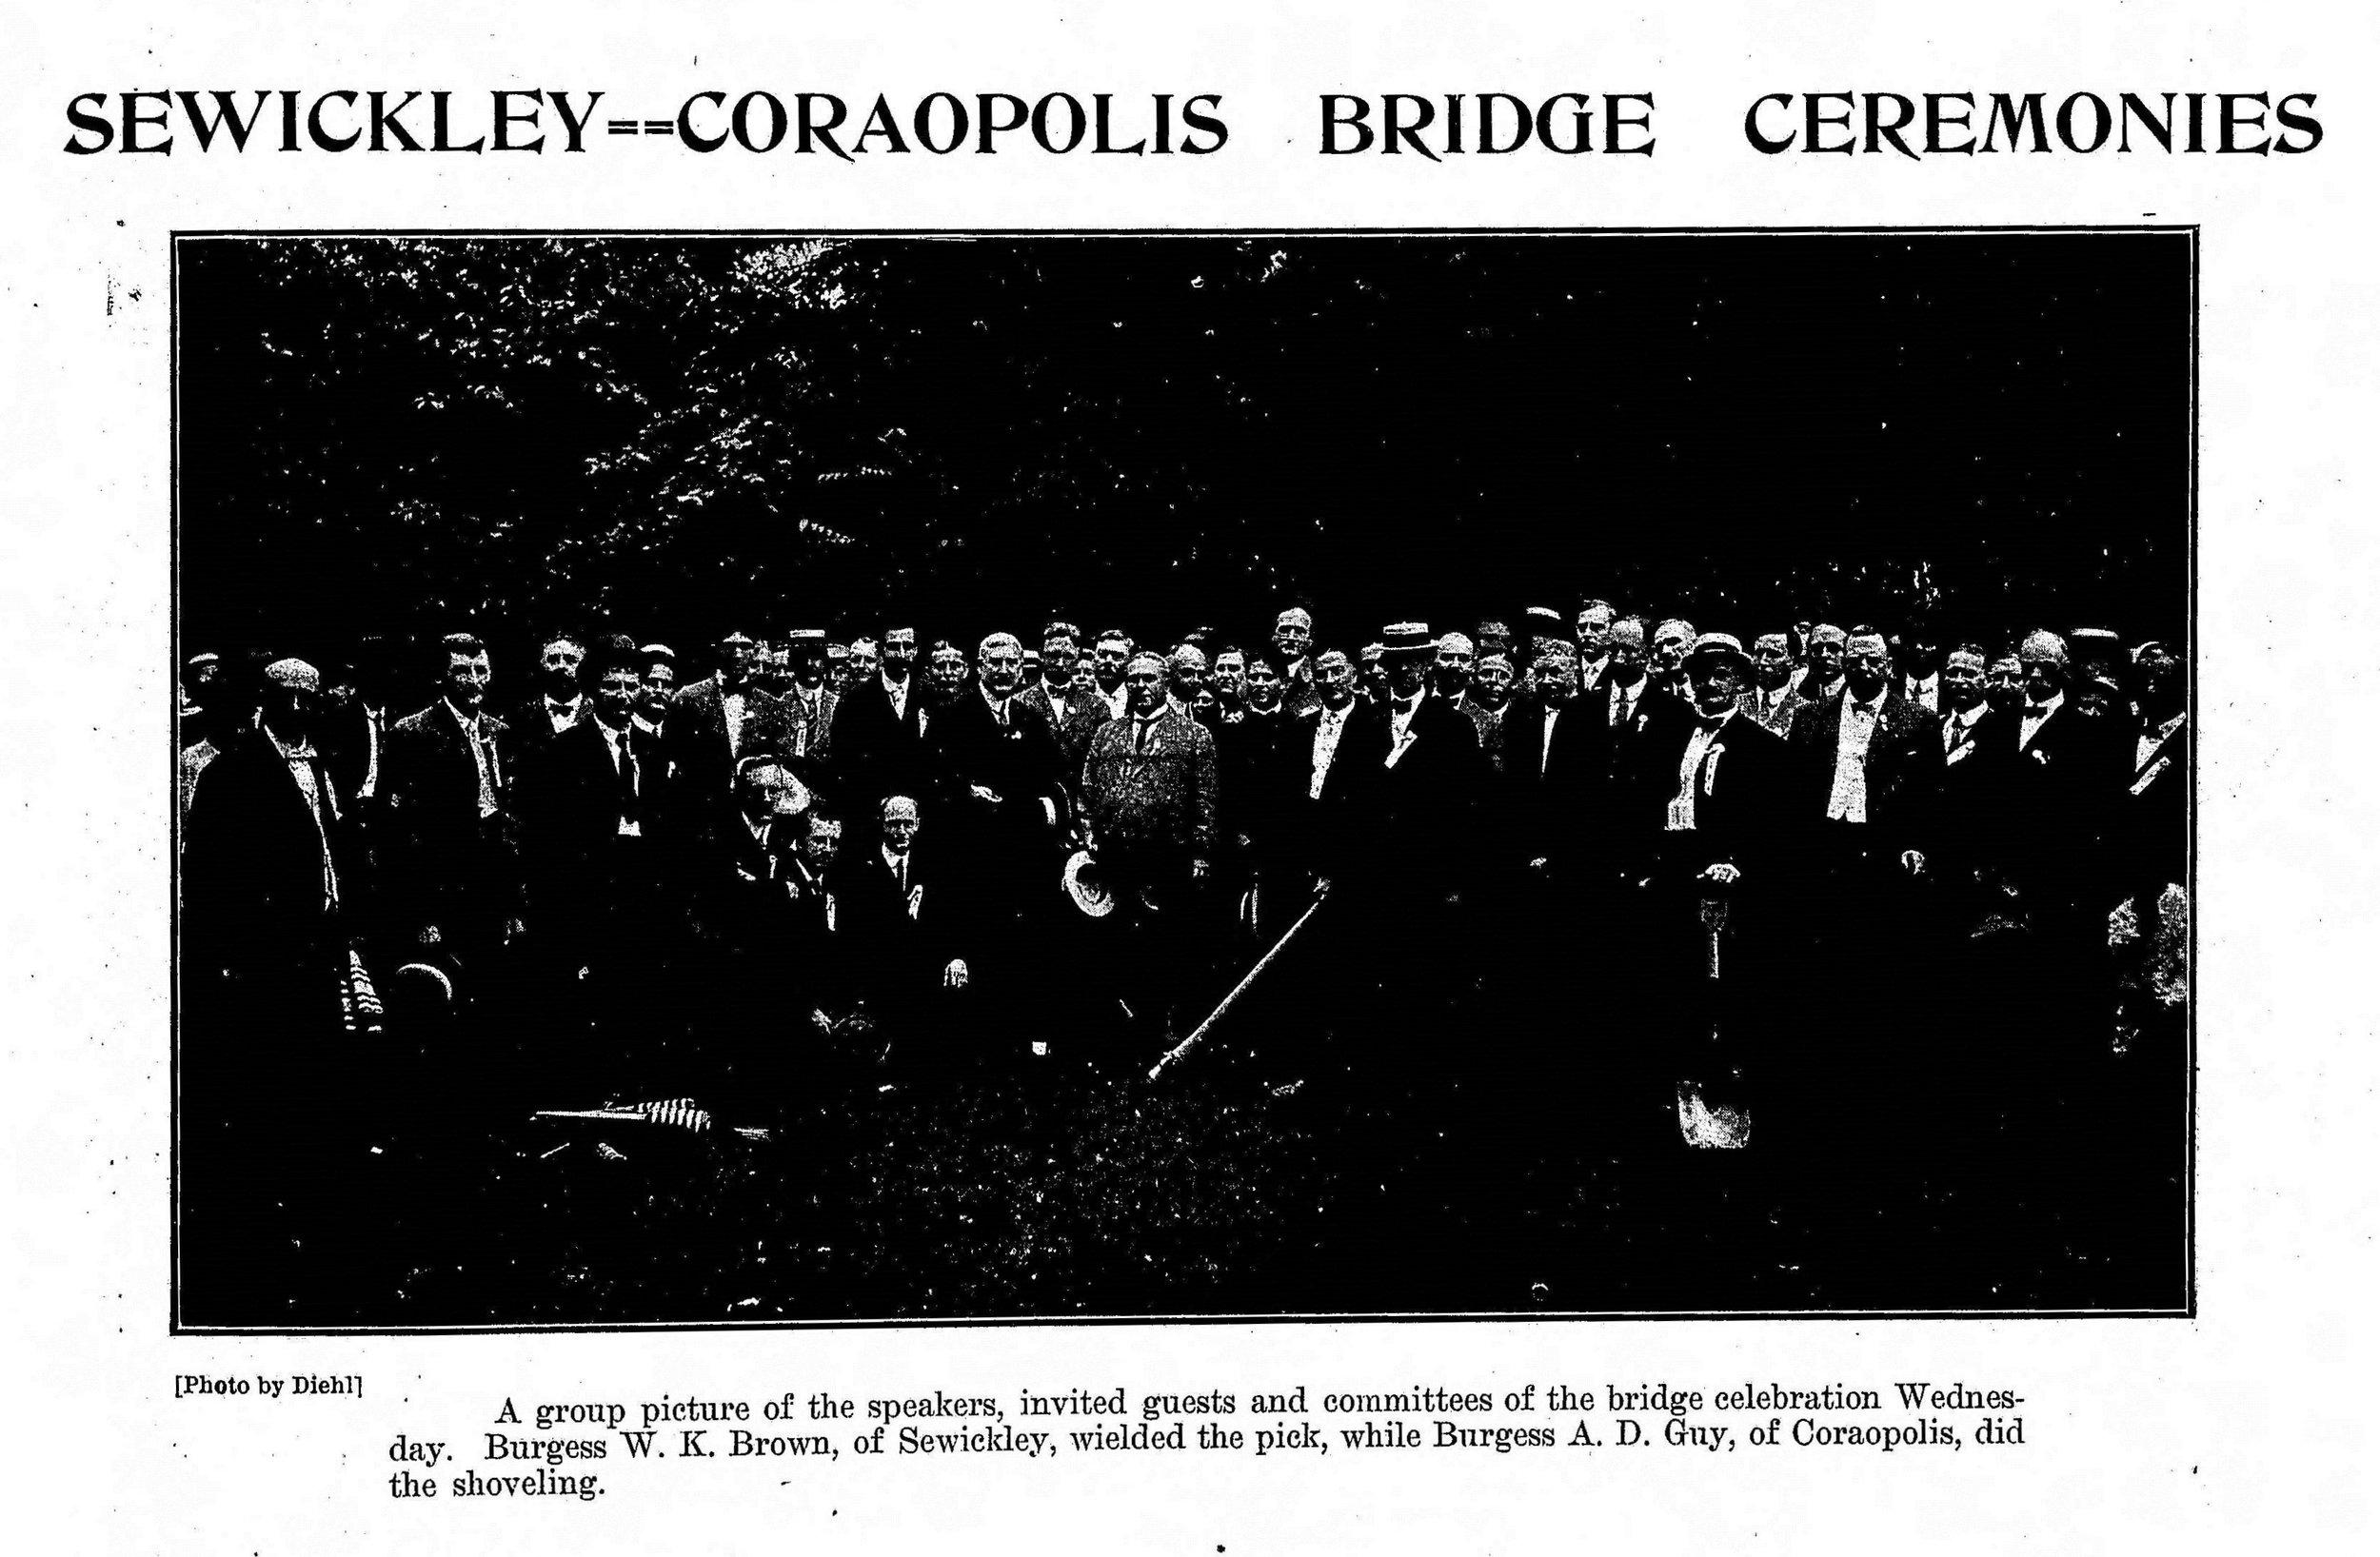 1909-07-24 The Weekly Herald (Sewickley Herald) - Bridge Celebration (pg1)Cropped.jpg